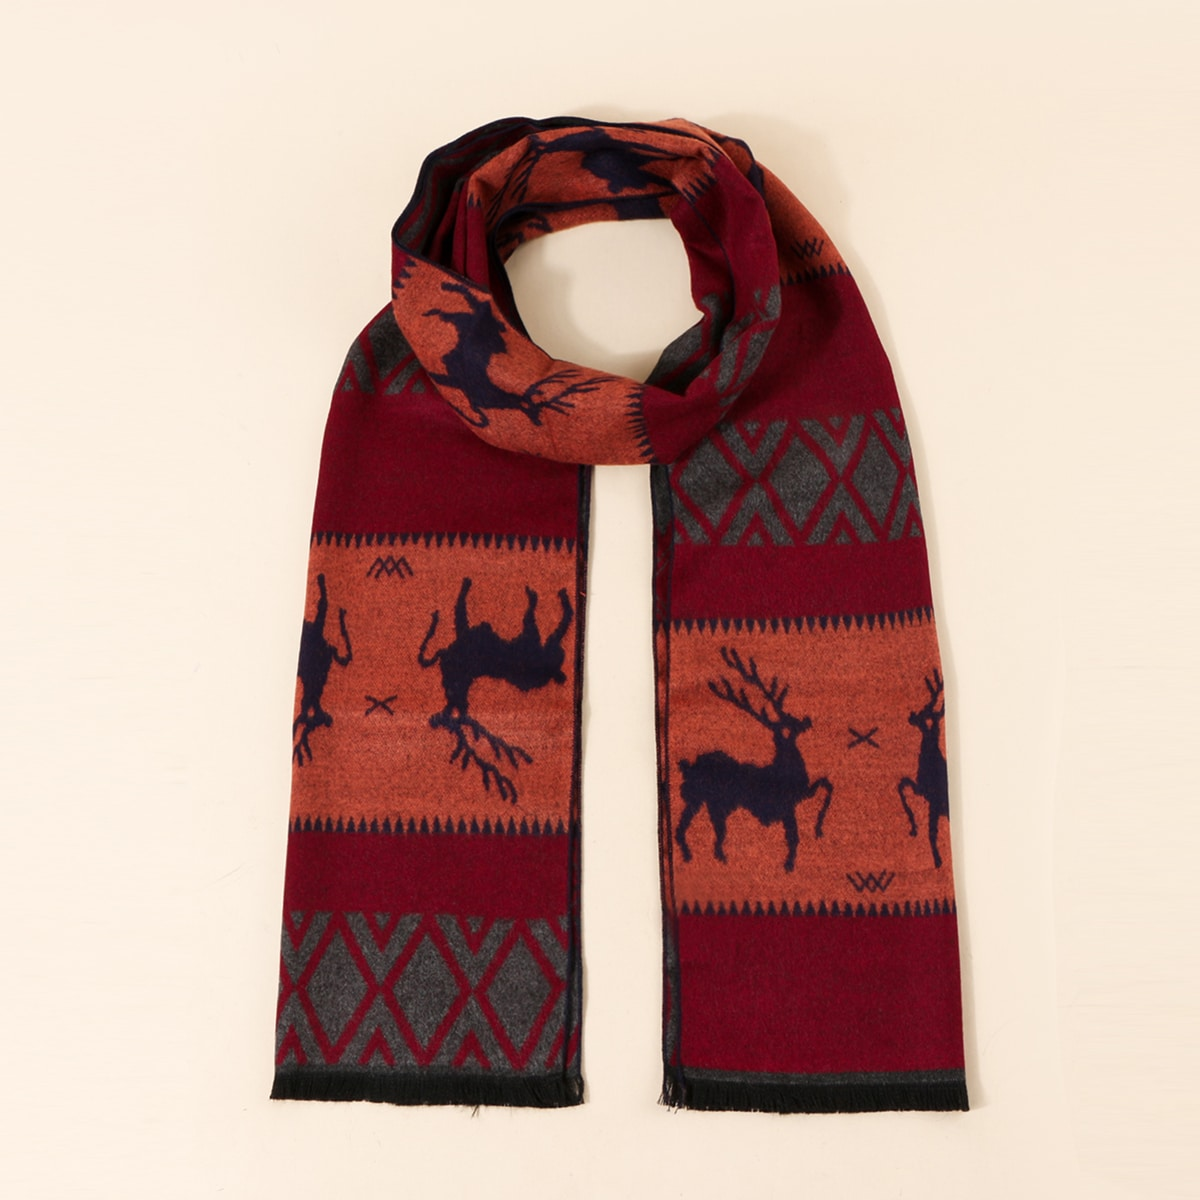 shein Mannen kerst dierlijke patroon sjaal